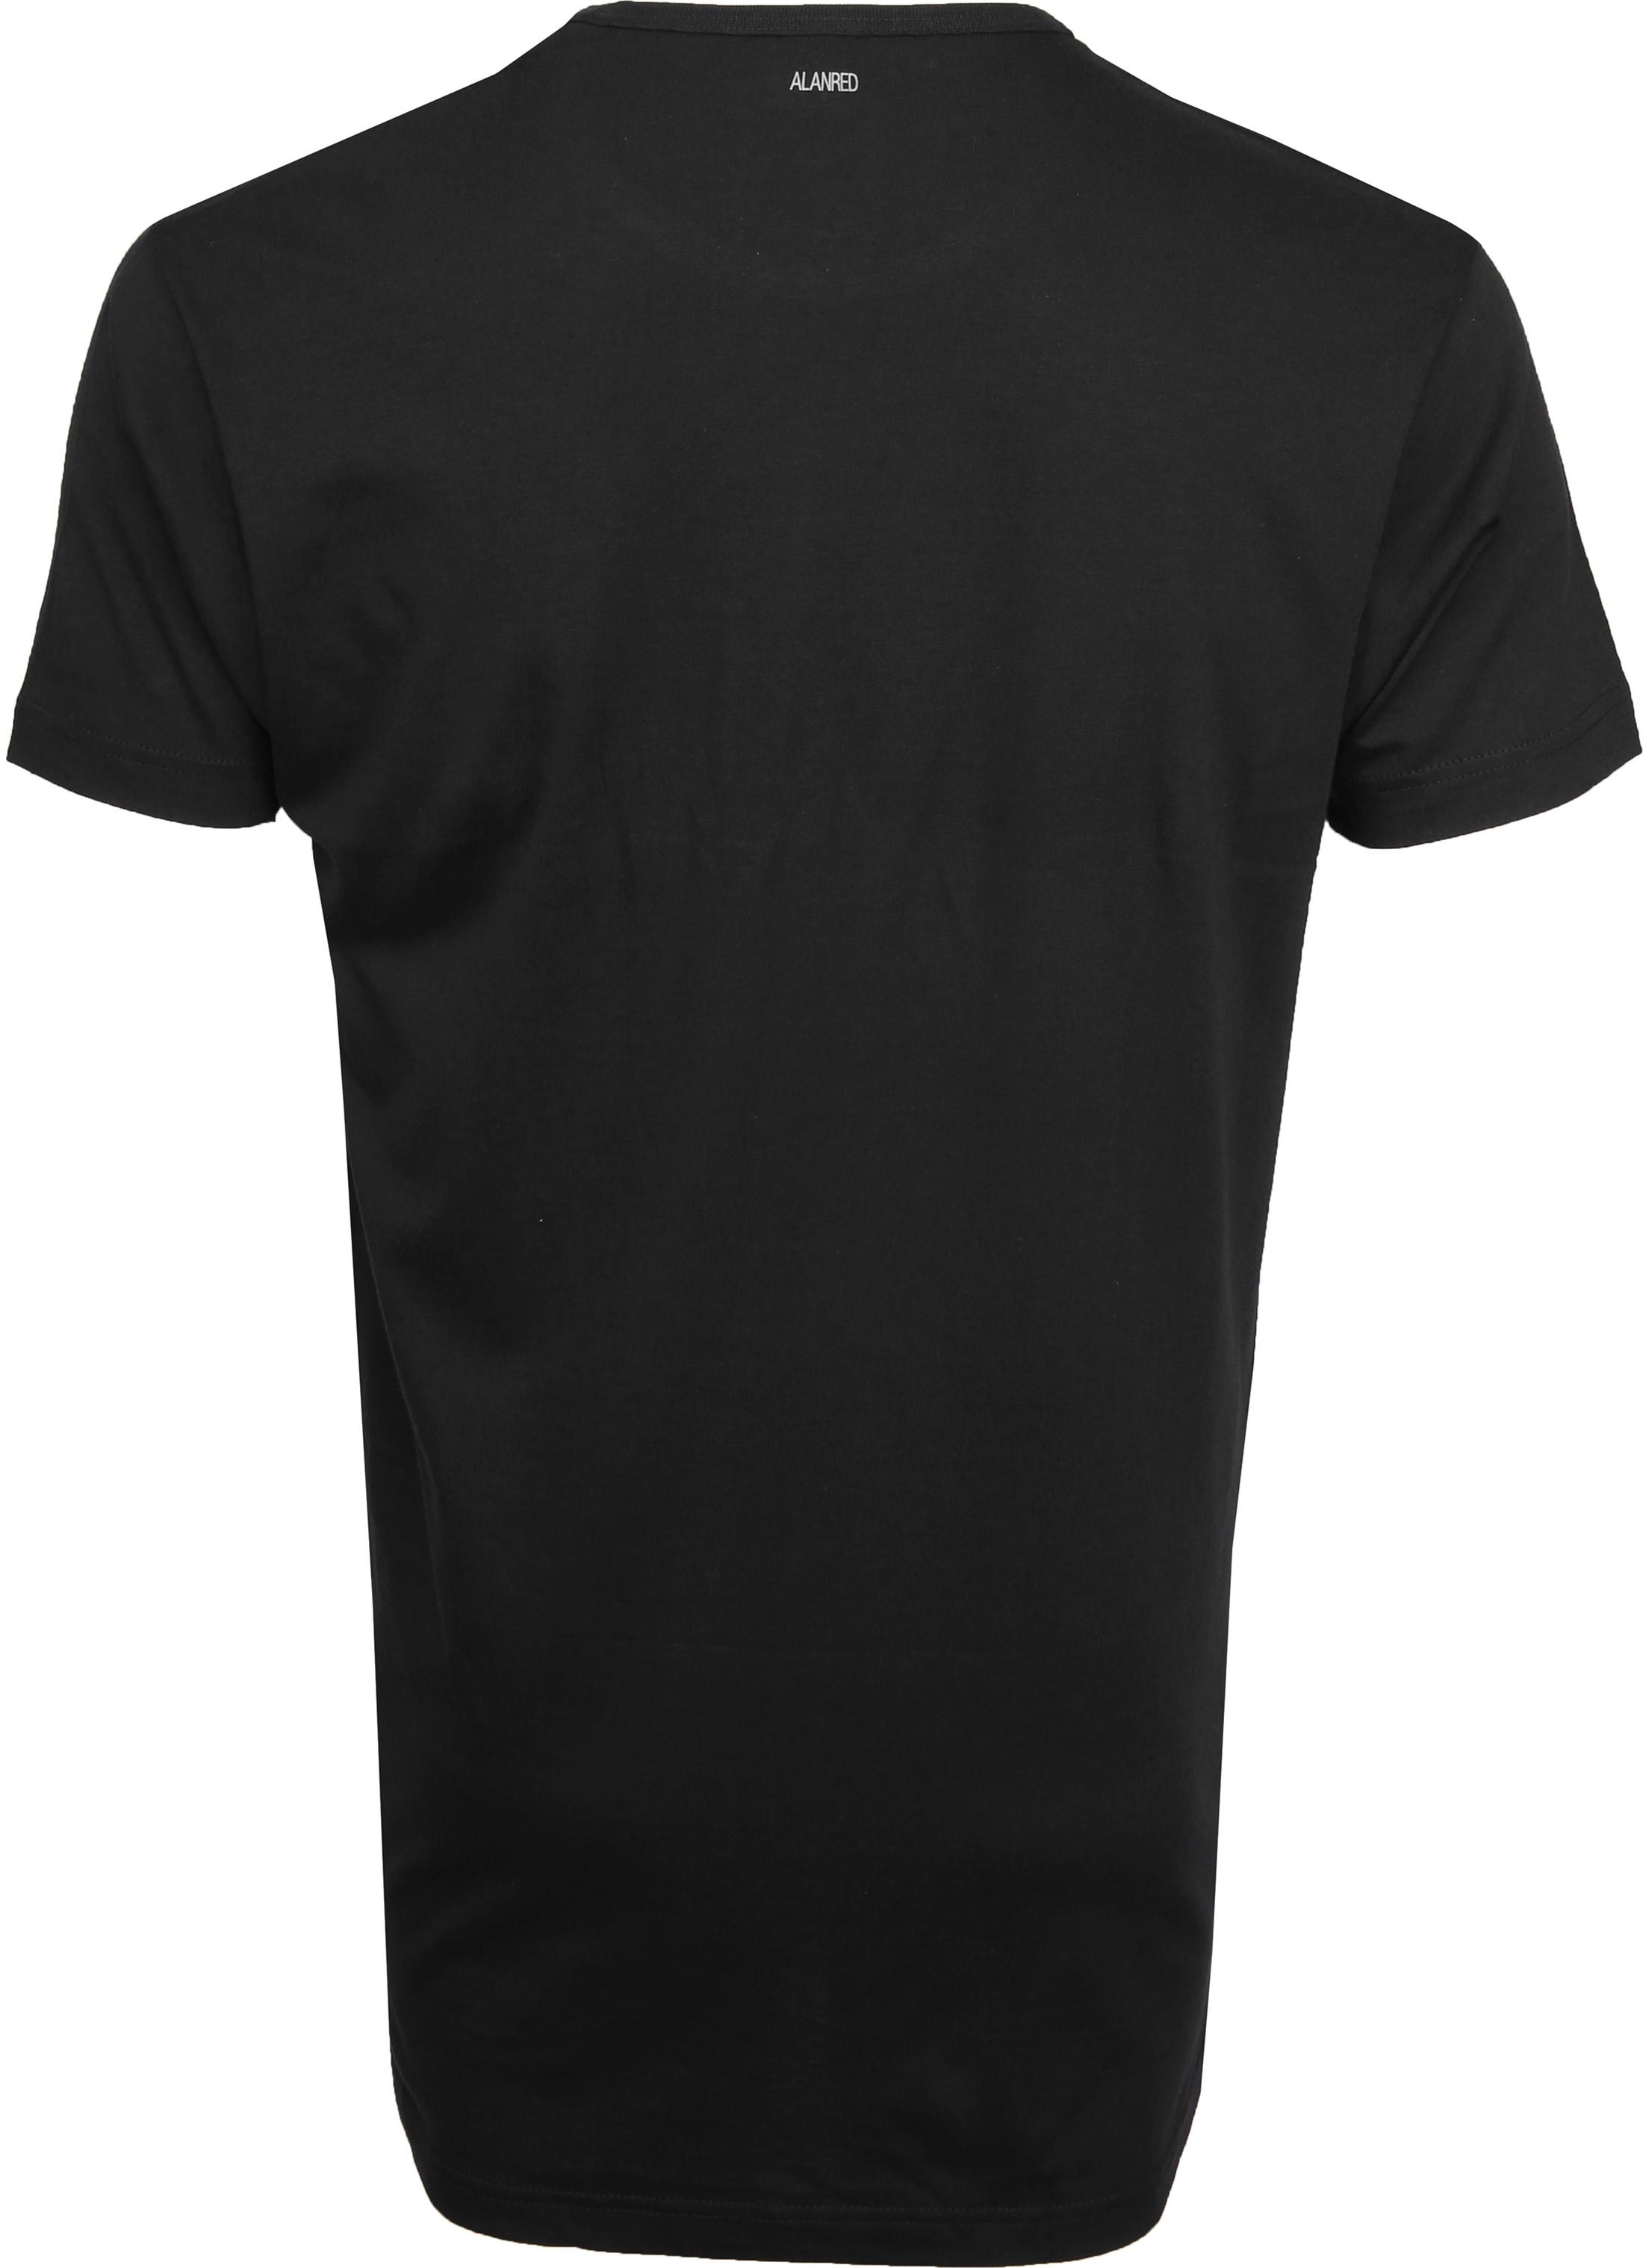 Alan Red Extra Lang T-Shirts Derby Schwarz (1 Pack) foto 2